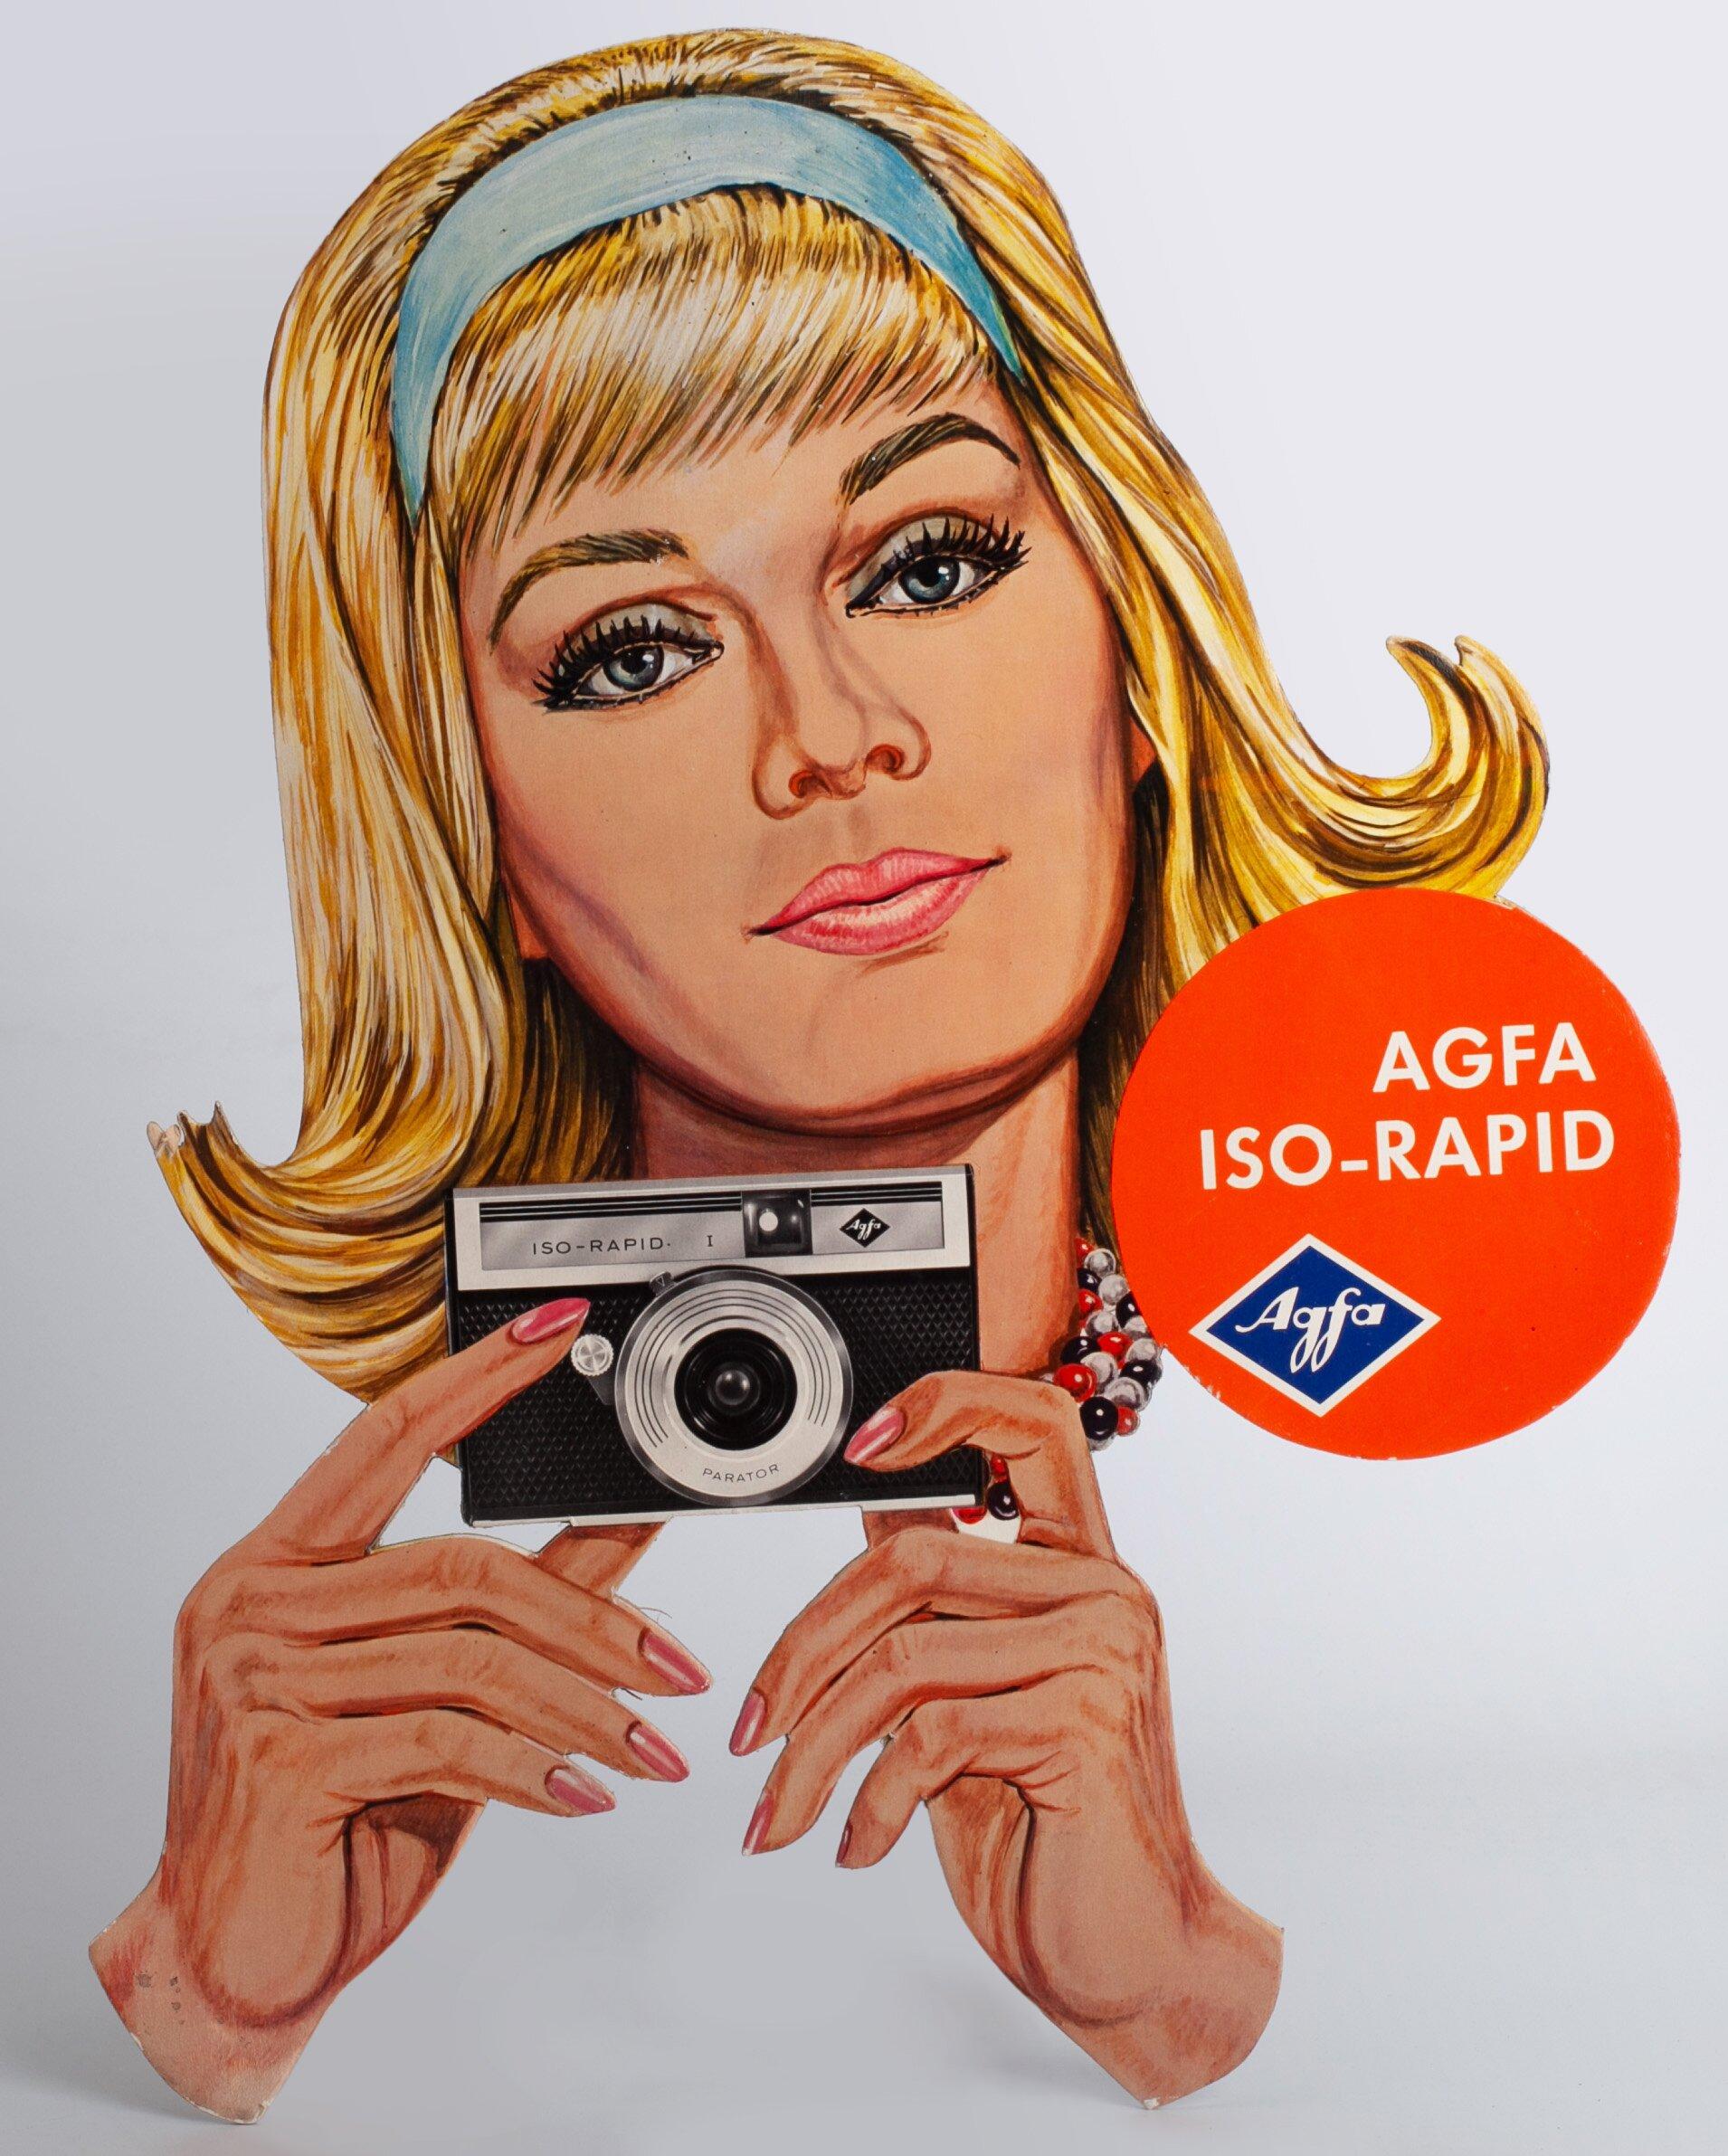 Agfa Iso-Rapid Werbung Werbeschild mit Frau 34x43cm